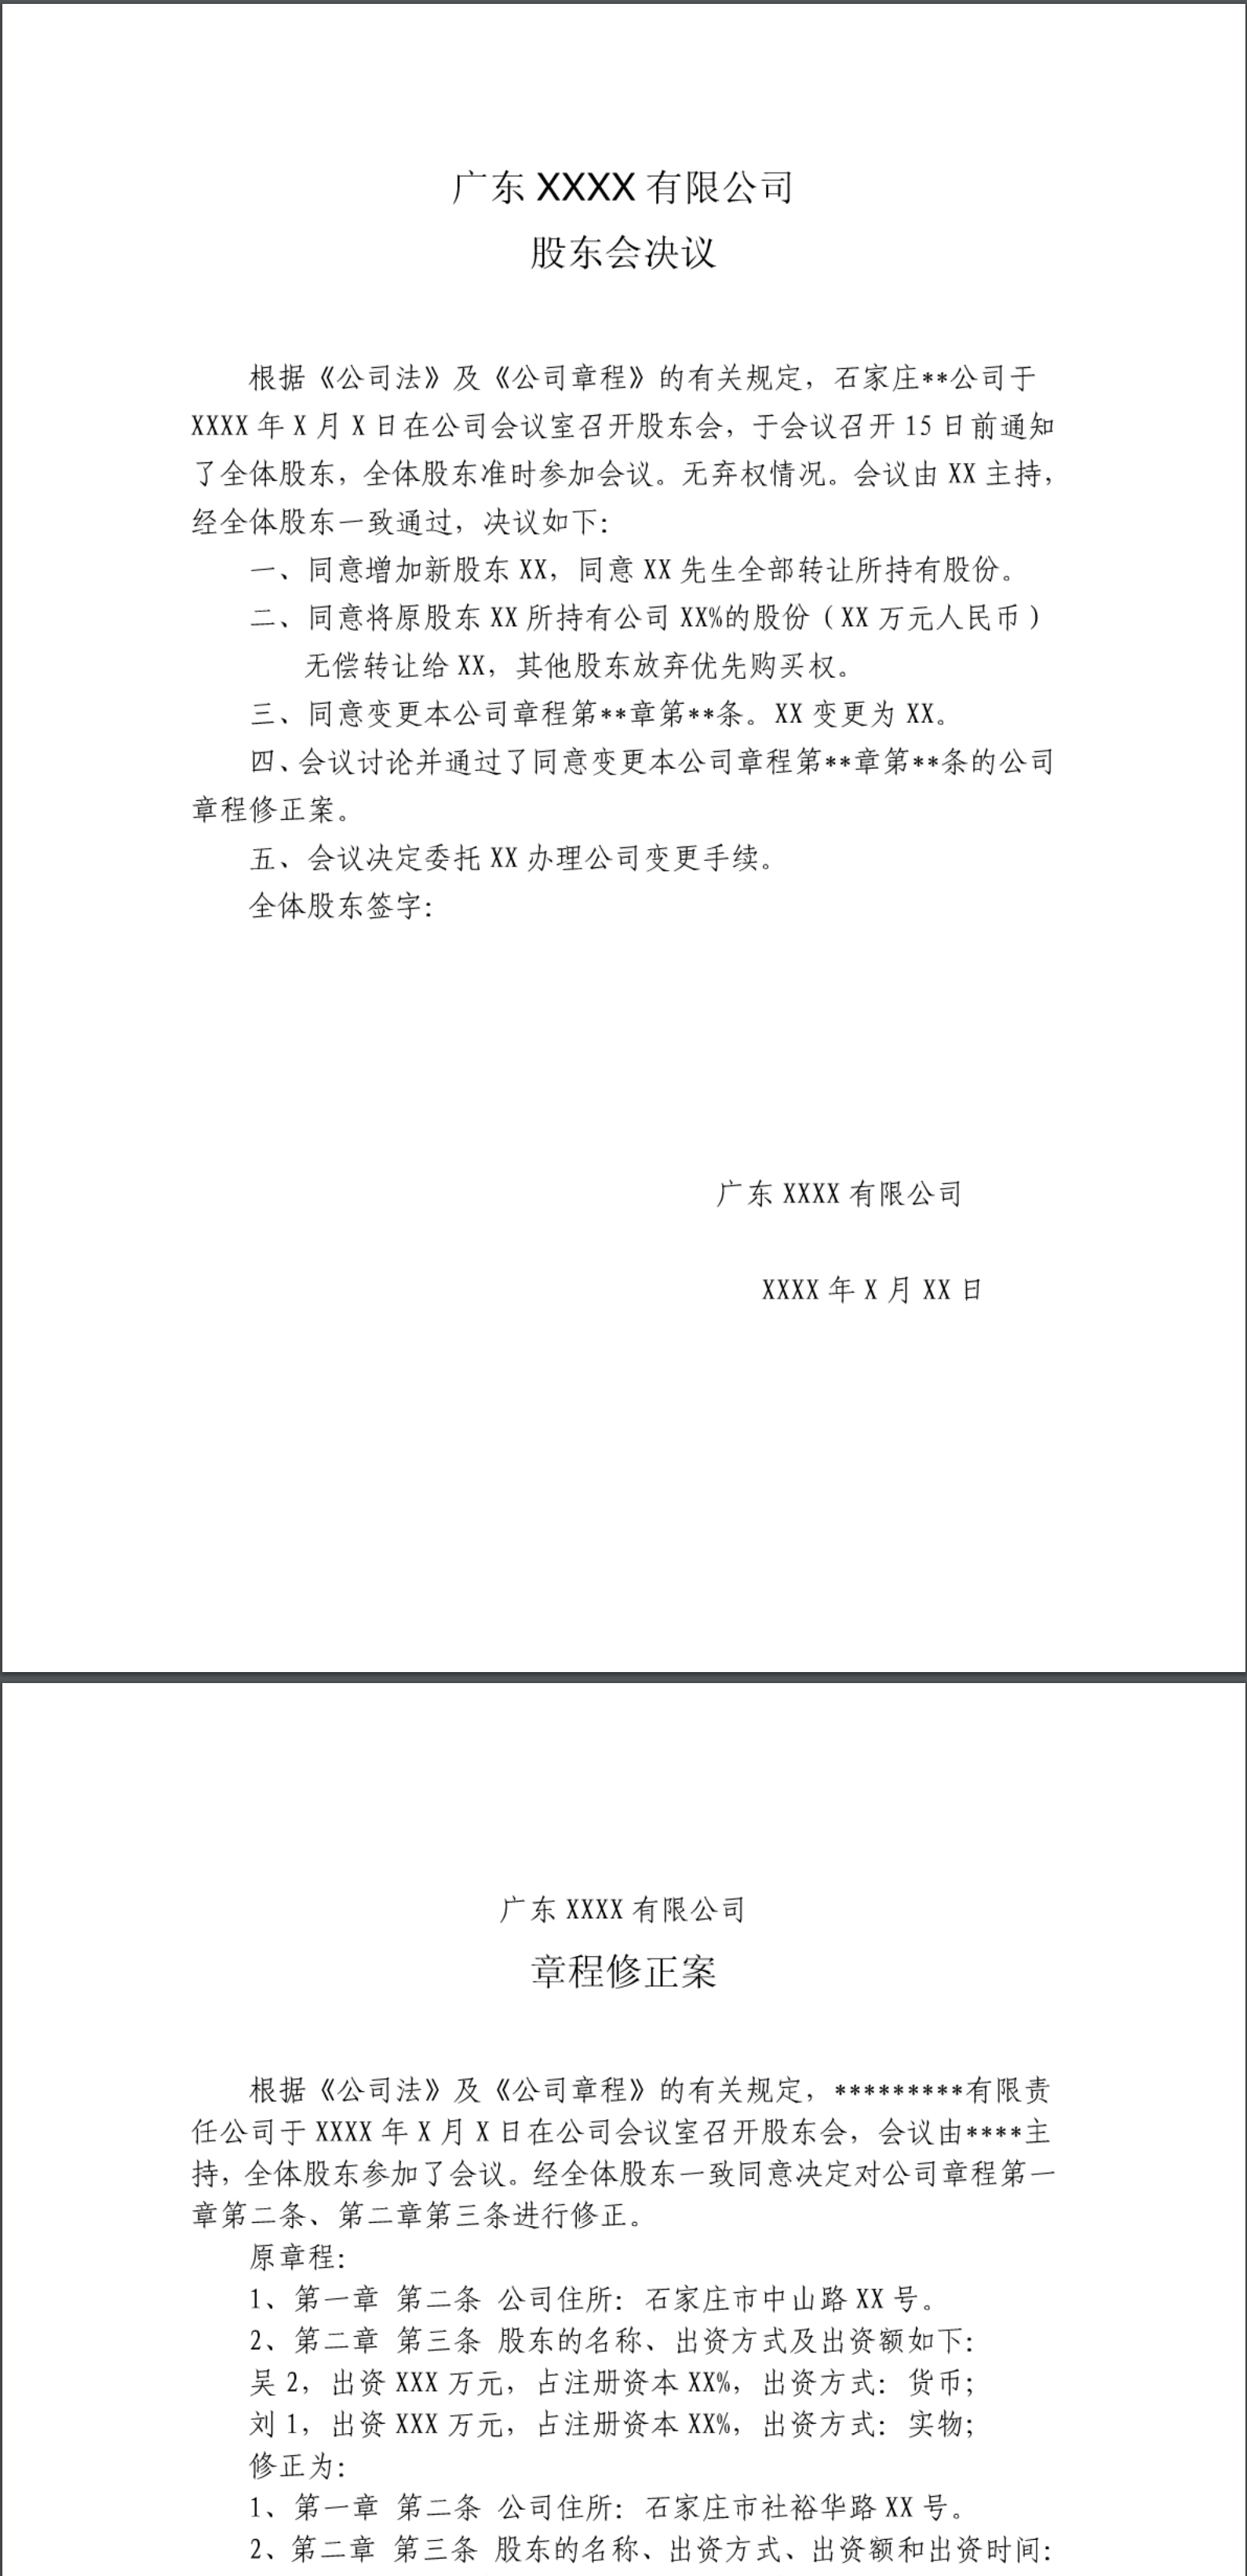 QQ截图20201120081809.png